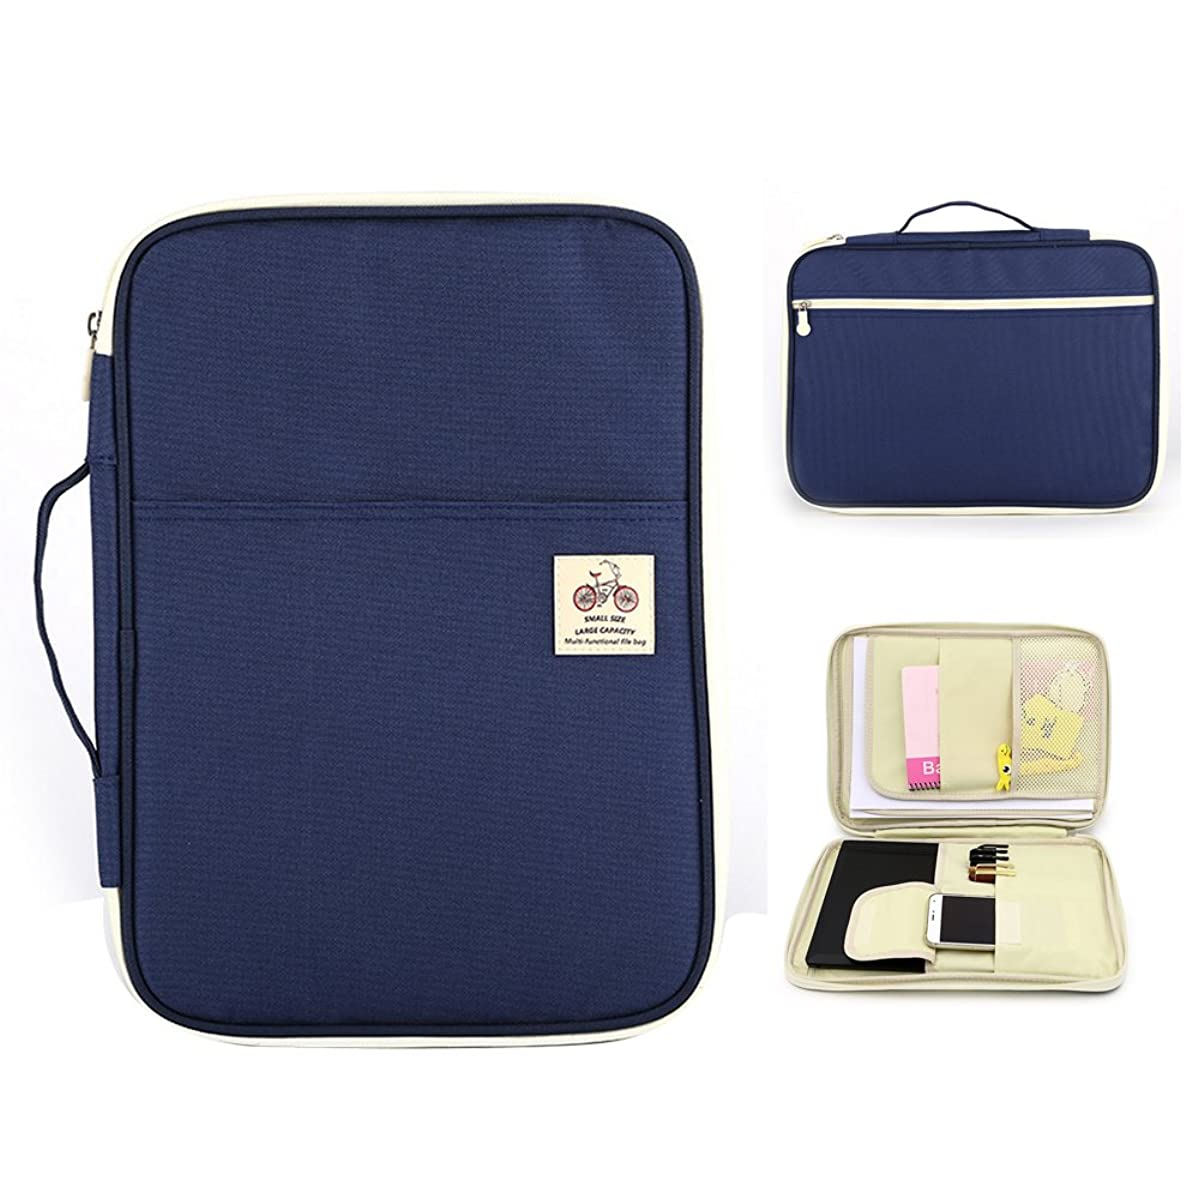 Aimeio Multifunction Handy A4 Portfolio Bag- Waterproof Document Organizer Tote Letter Size File Holder-13''Laptop Tablet Travel Pouch,Dark Blue